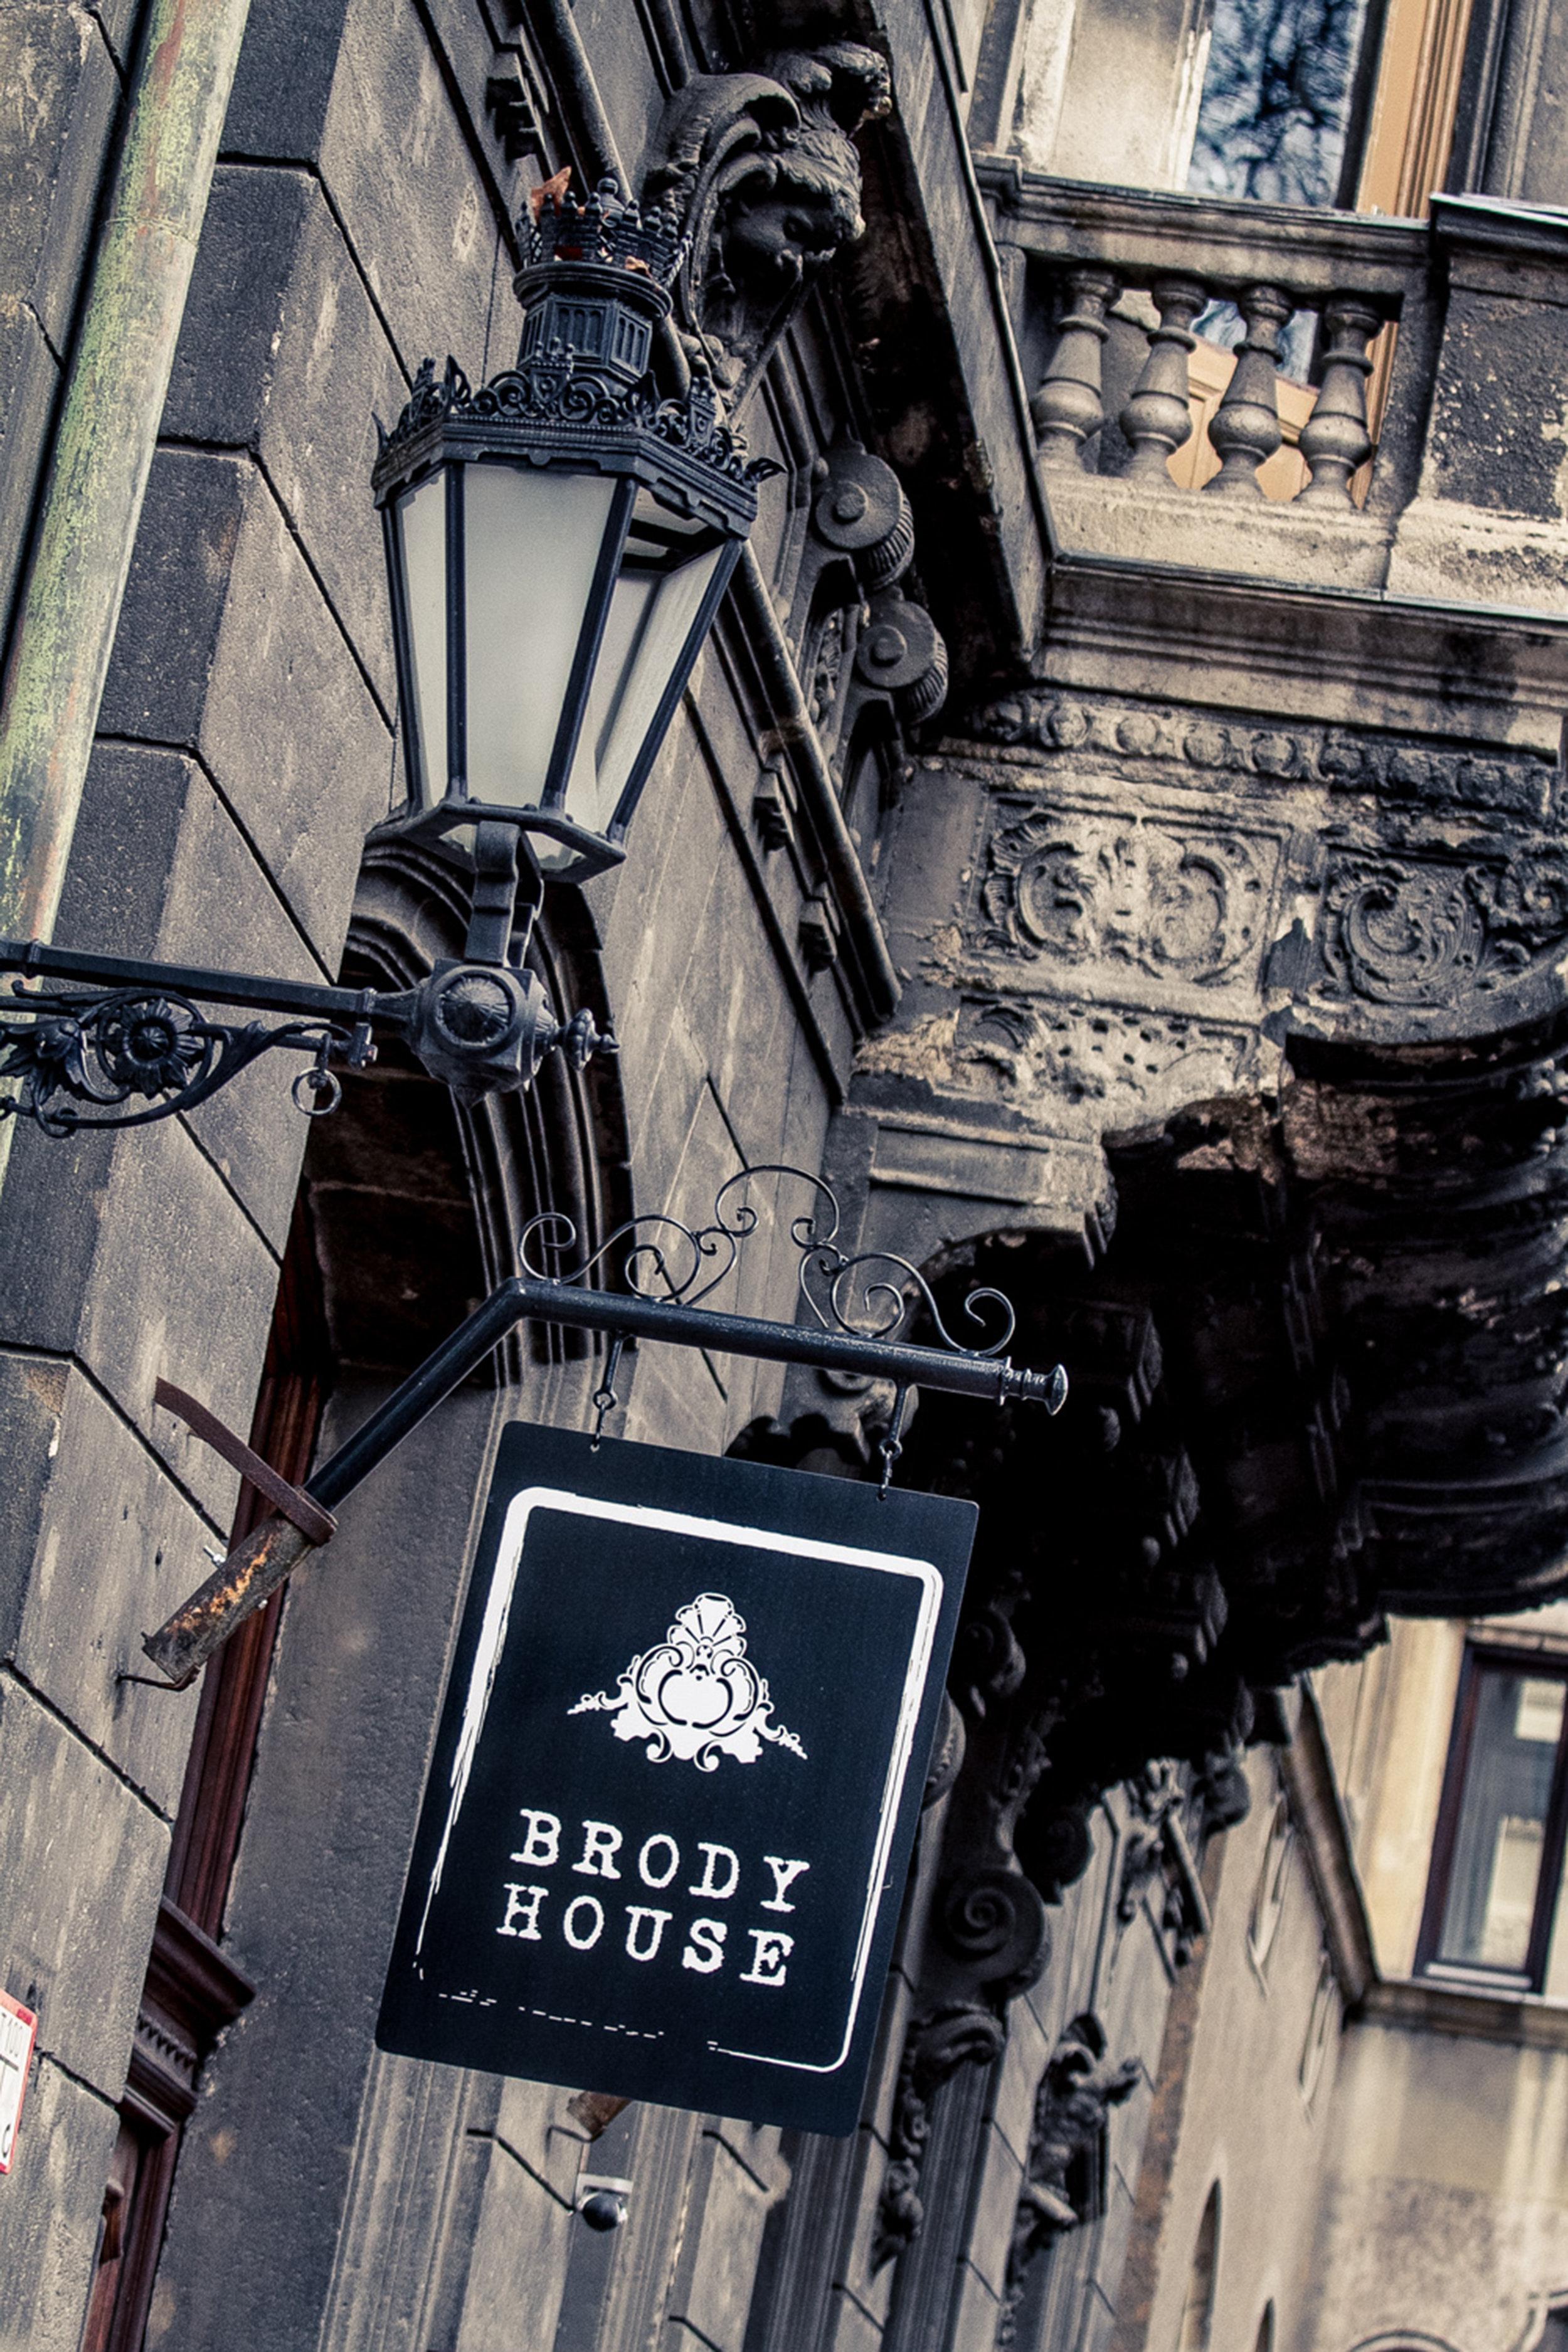 Brody House - photo by Laszlo Balkanyi 300dpi (1).jpg